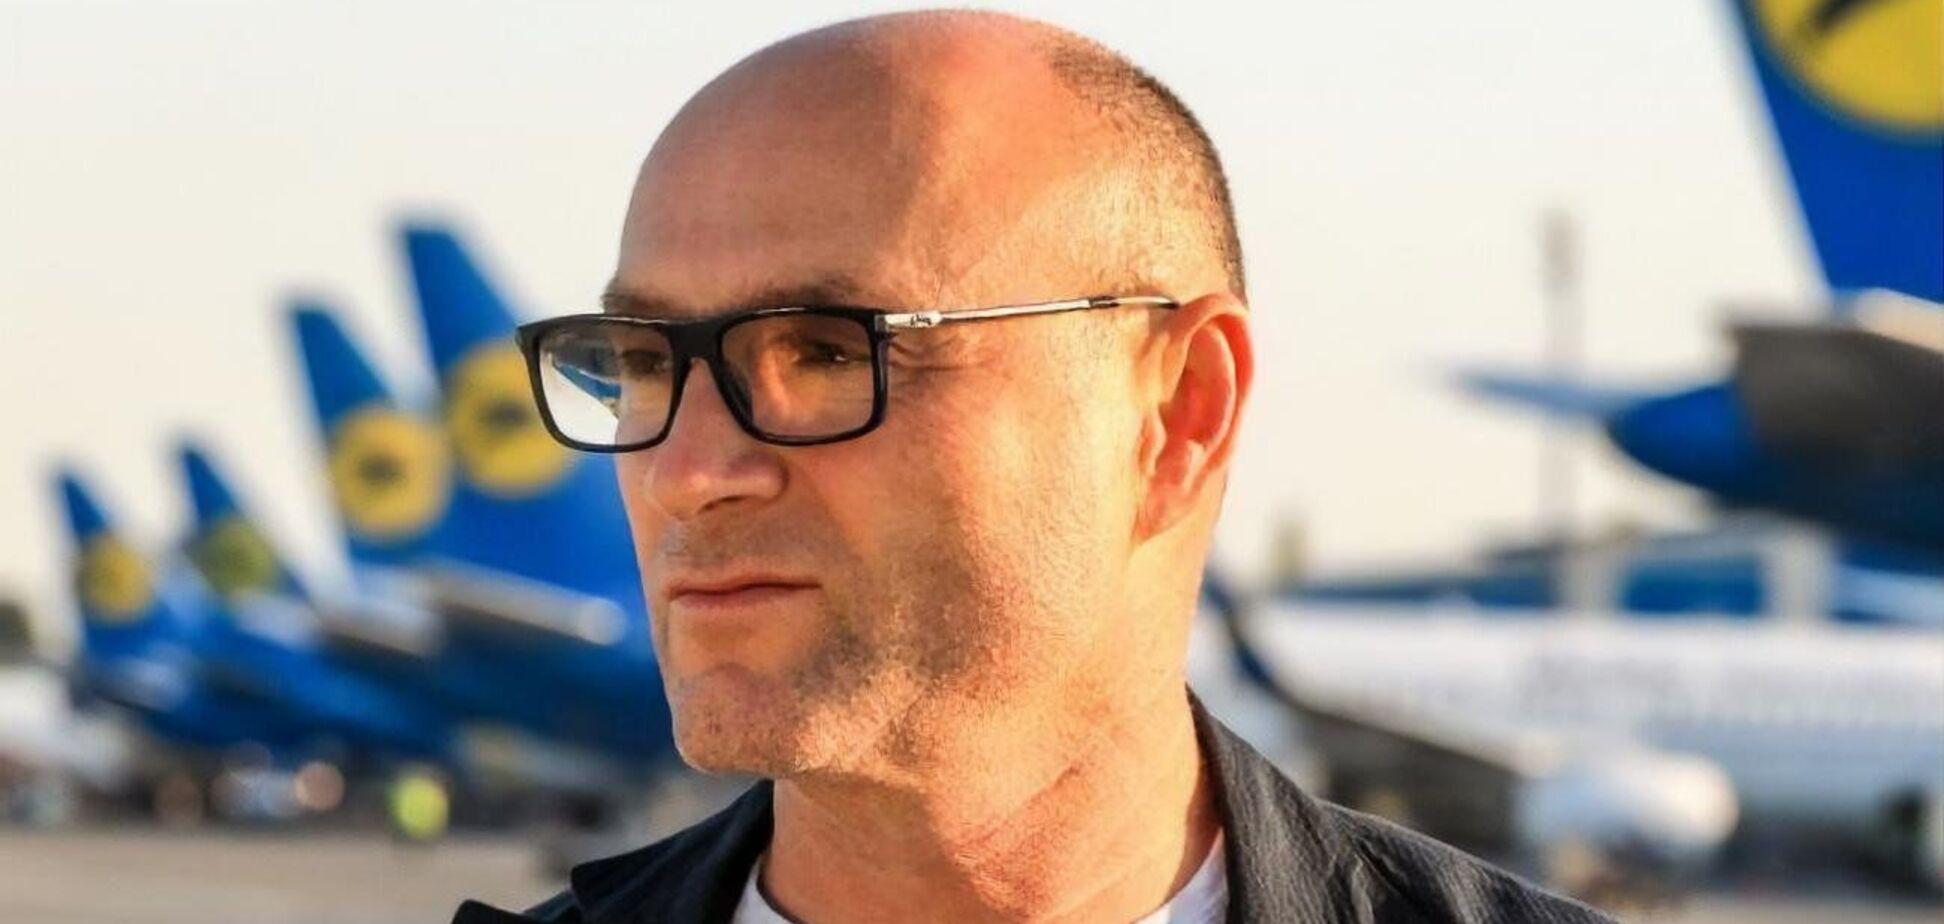 Адвокат назвал абсурдными обвинения НАБУ против Евгения Дыхне